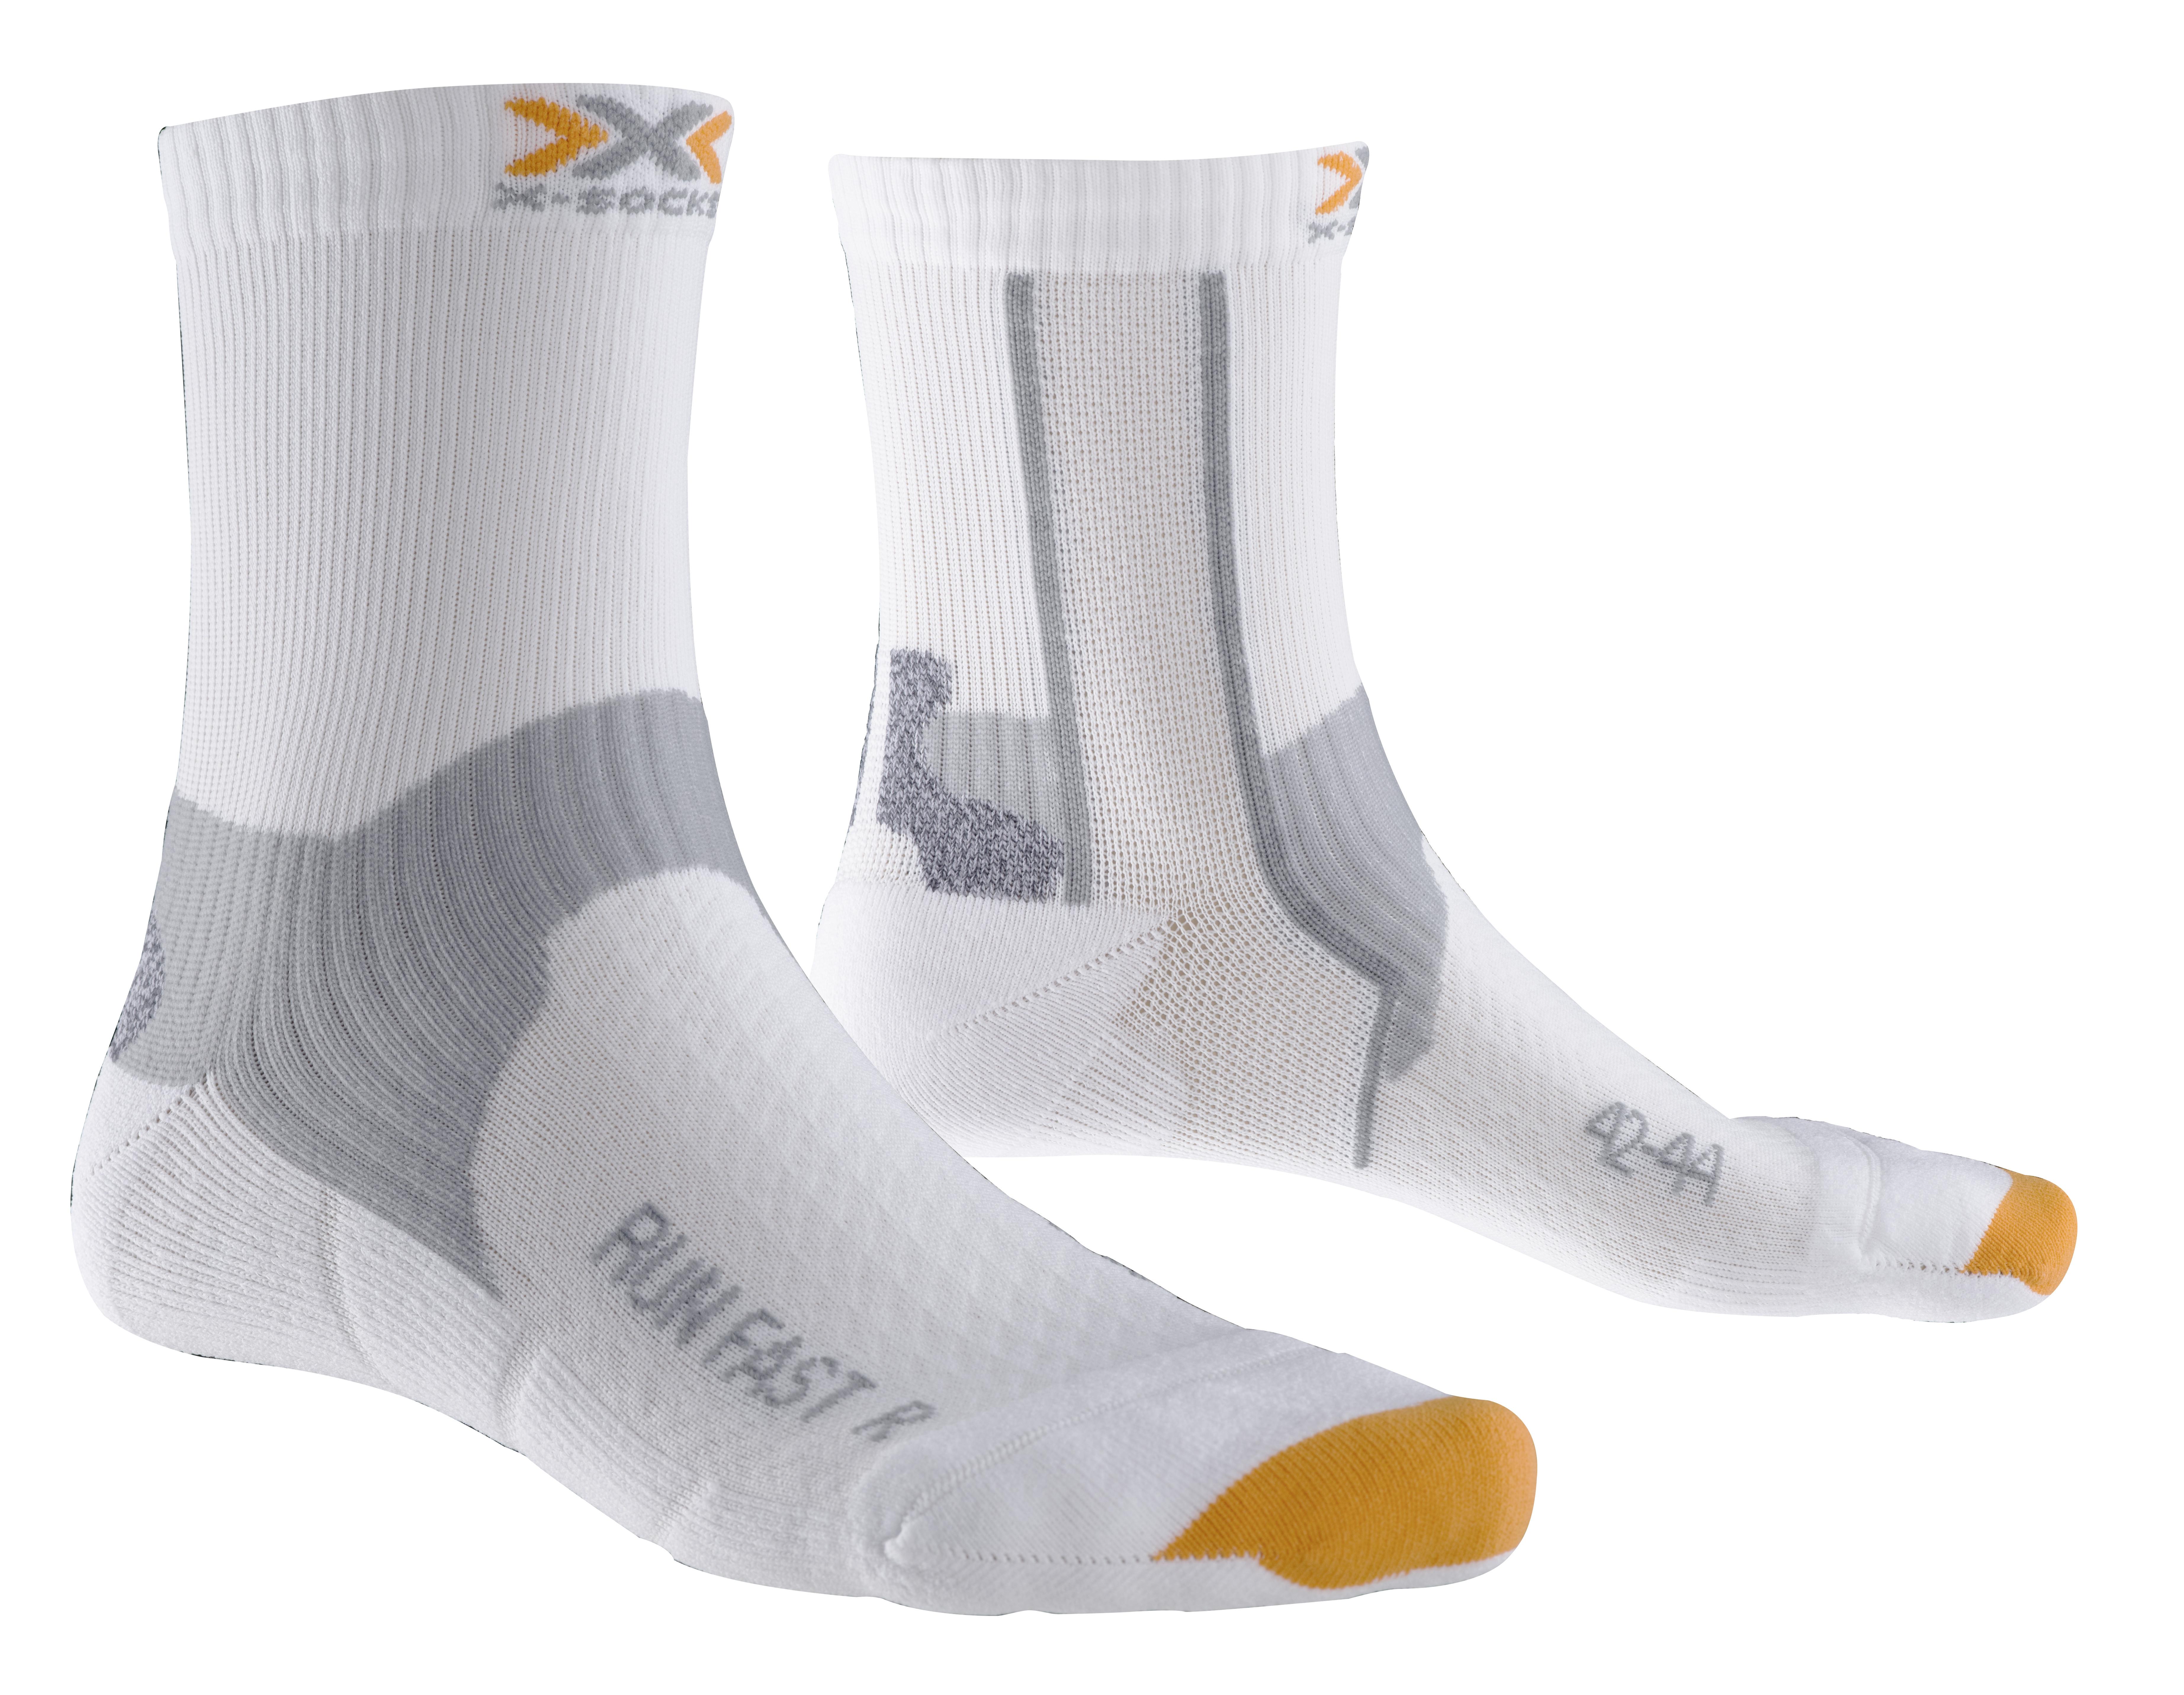 X-SOCKS Socken, Strümpfe Run Fast weiß unisex von Gr. 35 - 47 S17-XS1